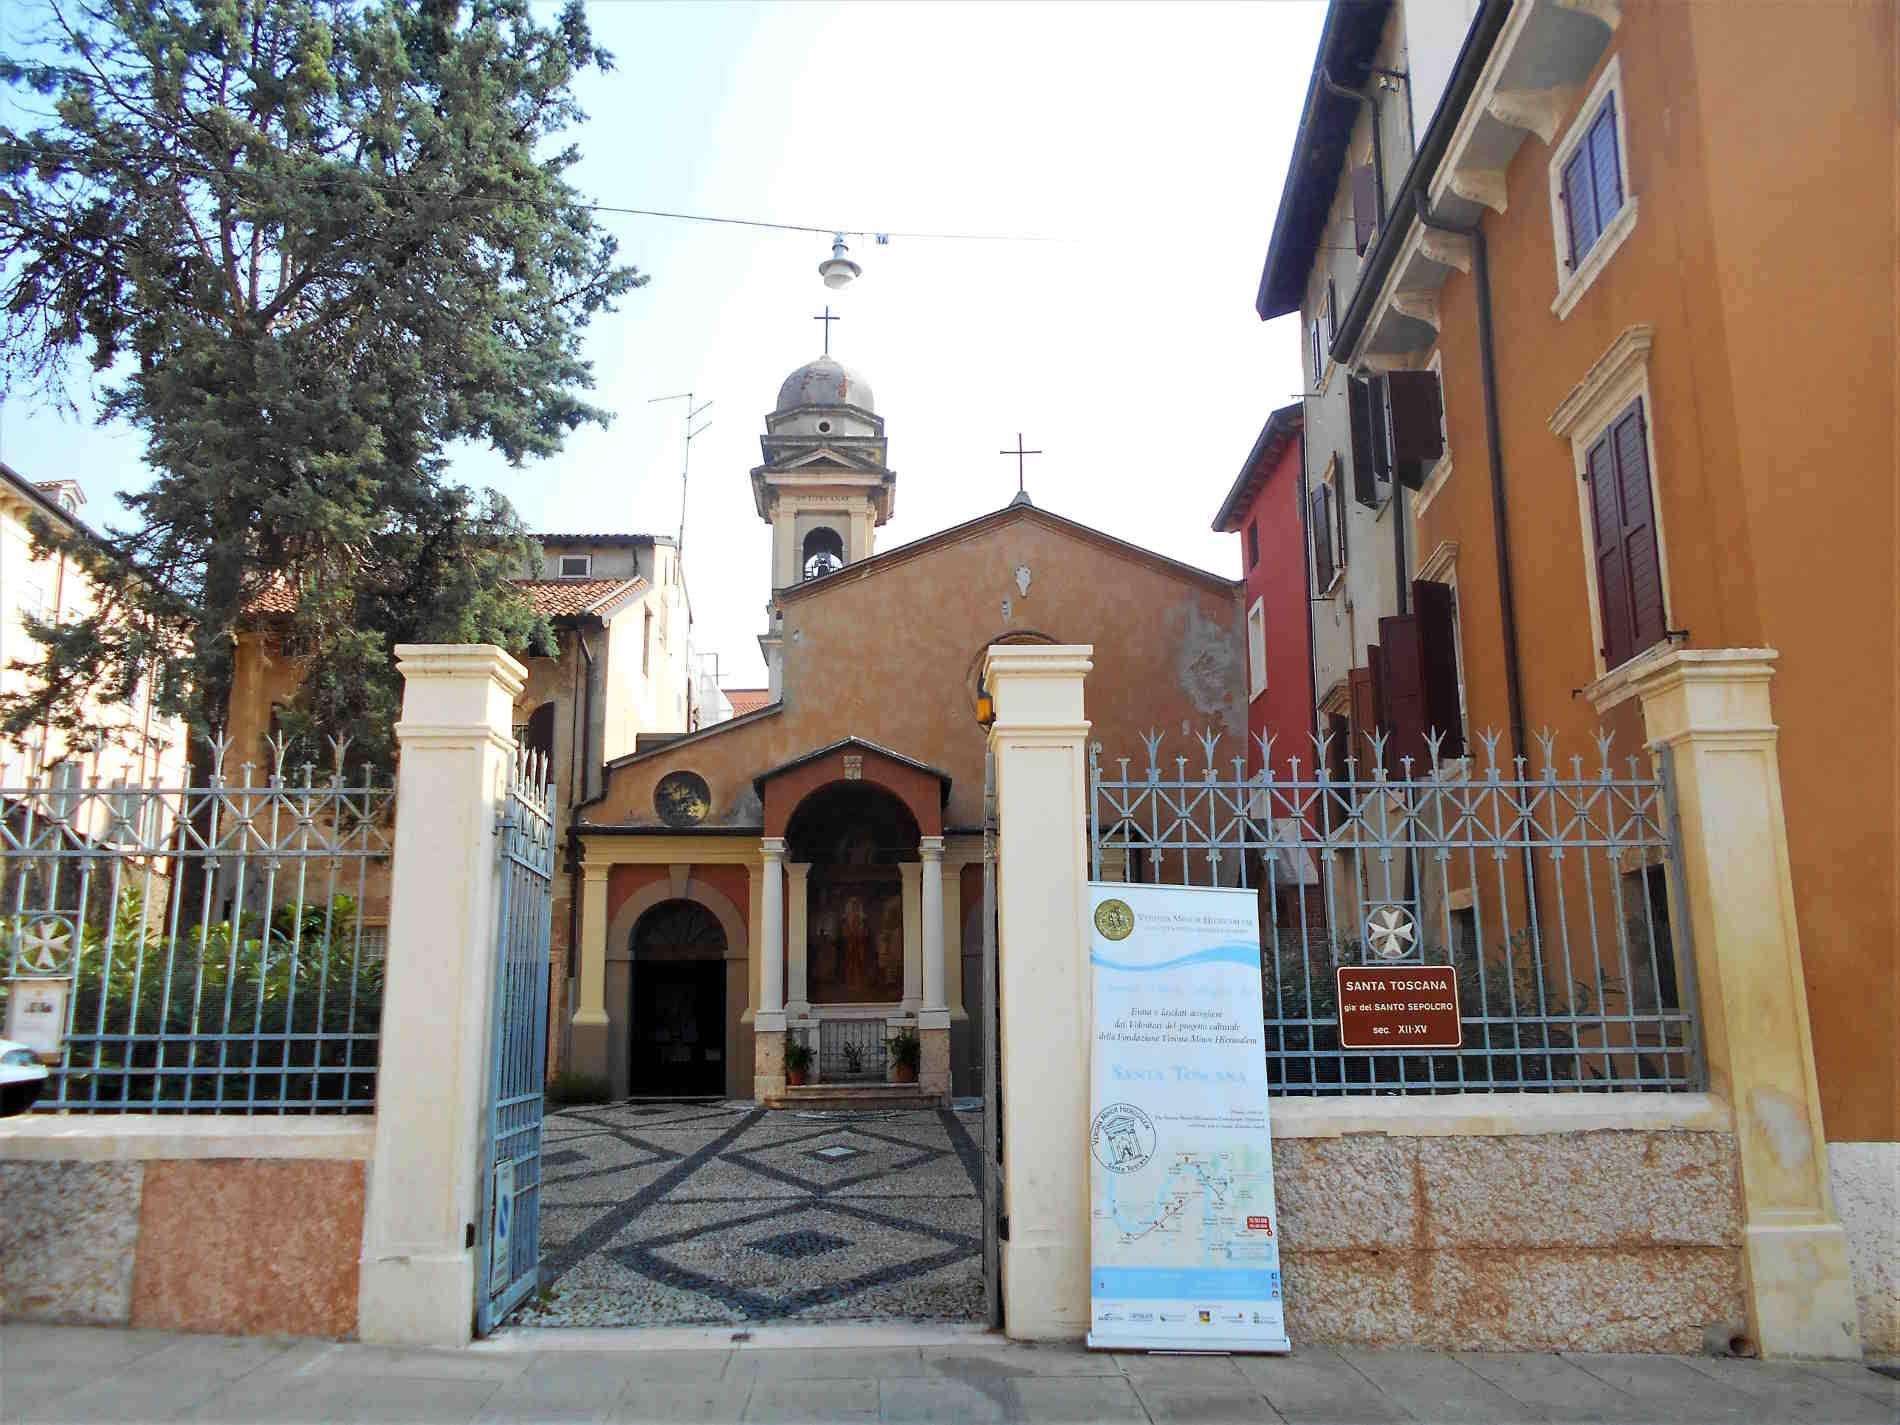 Ingresso alla Chiesa di Santa Toscana a verona